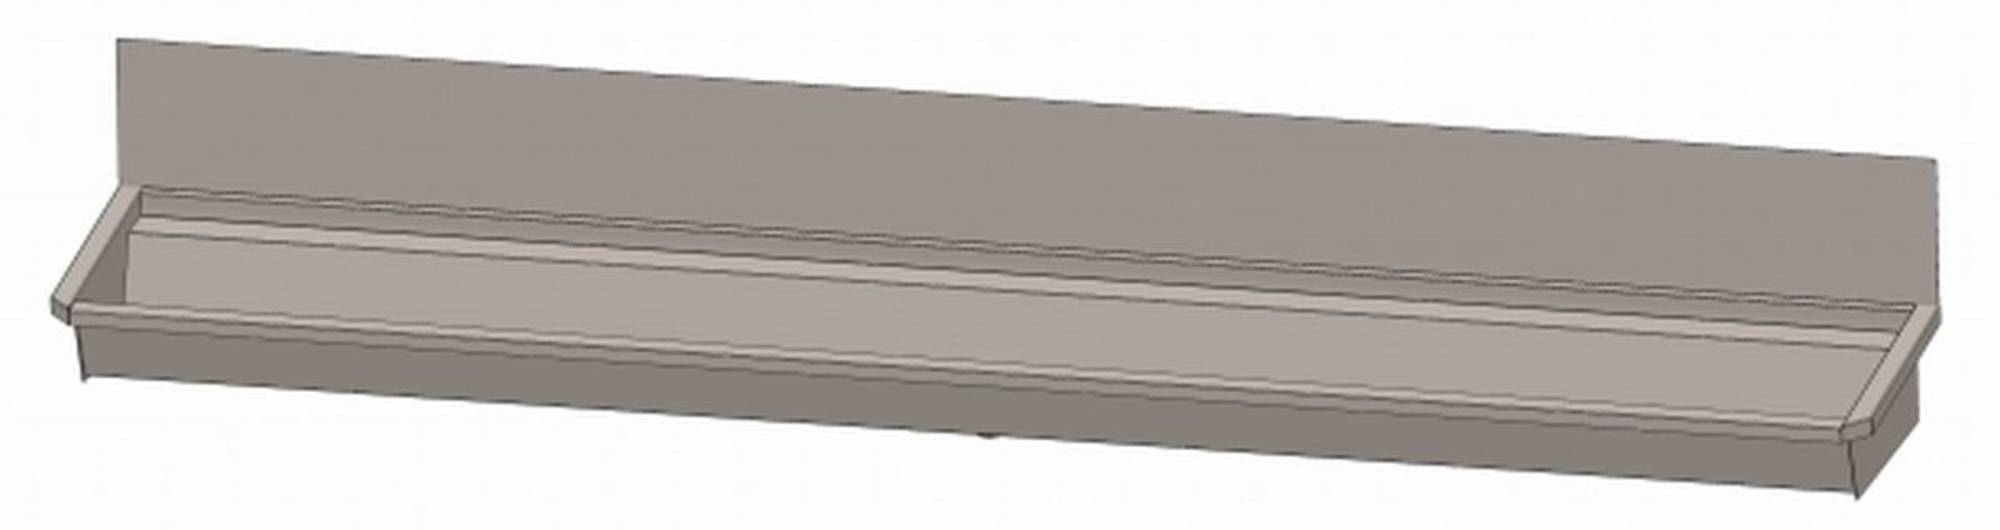 INTERSAN SANILAV wasgoot met spatbord 300 cm.5 pers. zonder leiding INOX 304 (305Z1)